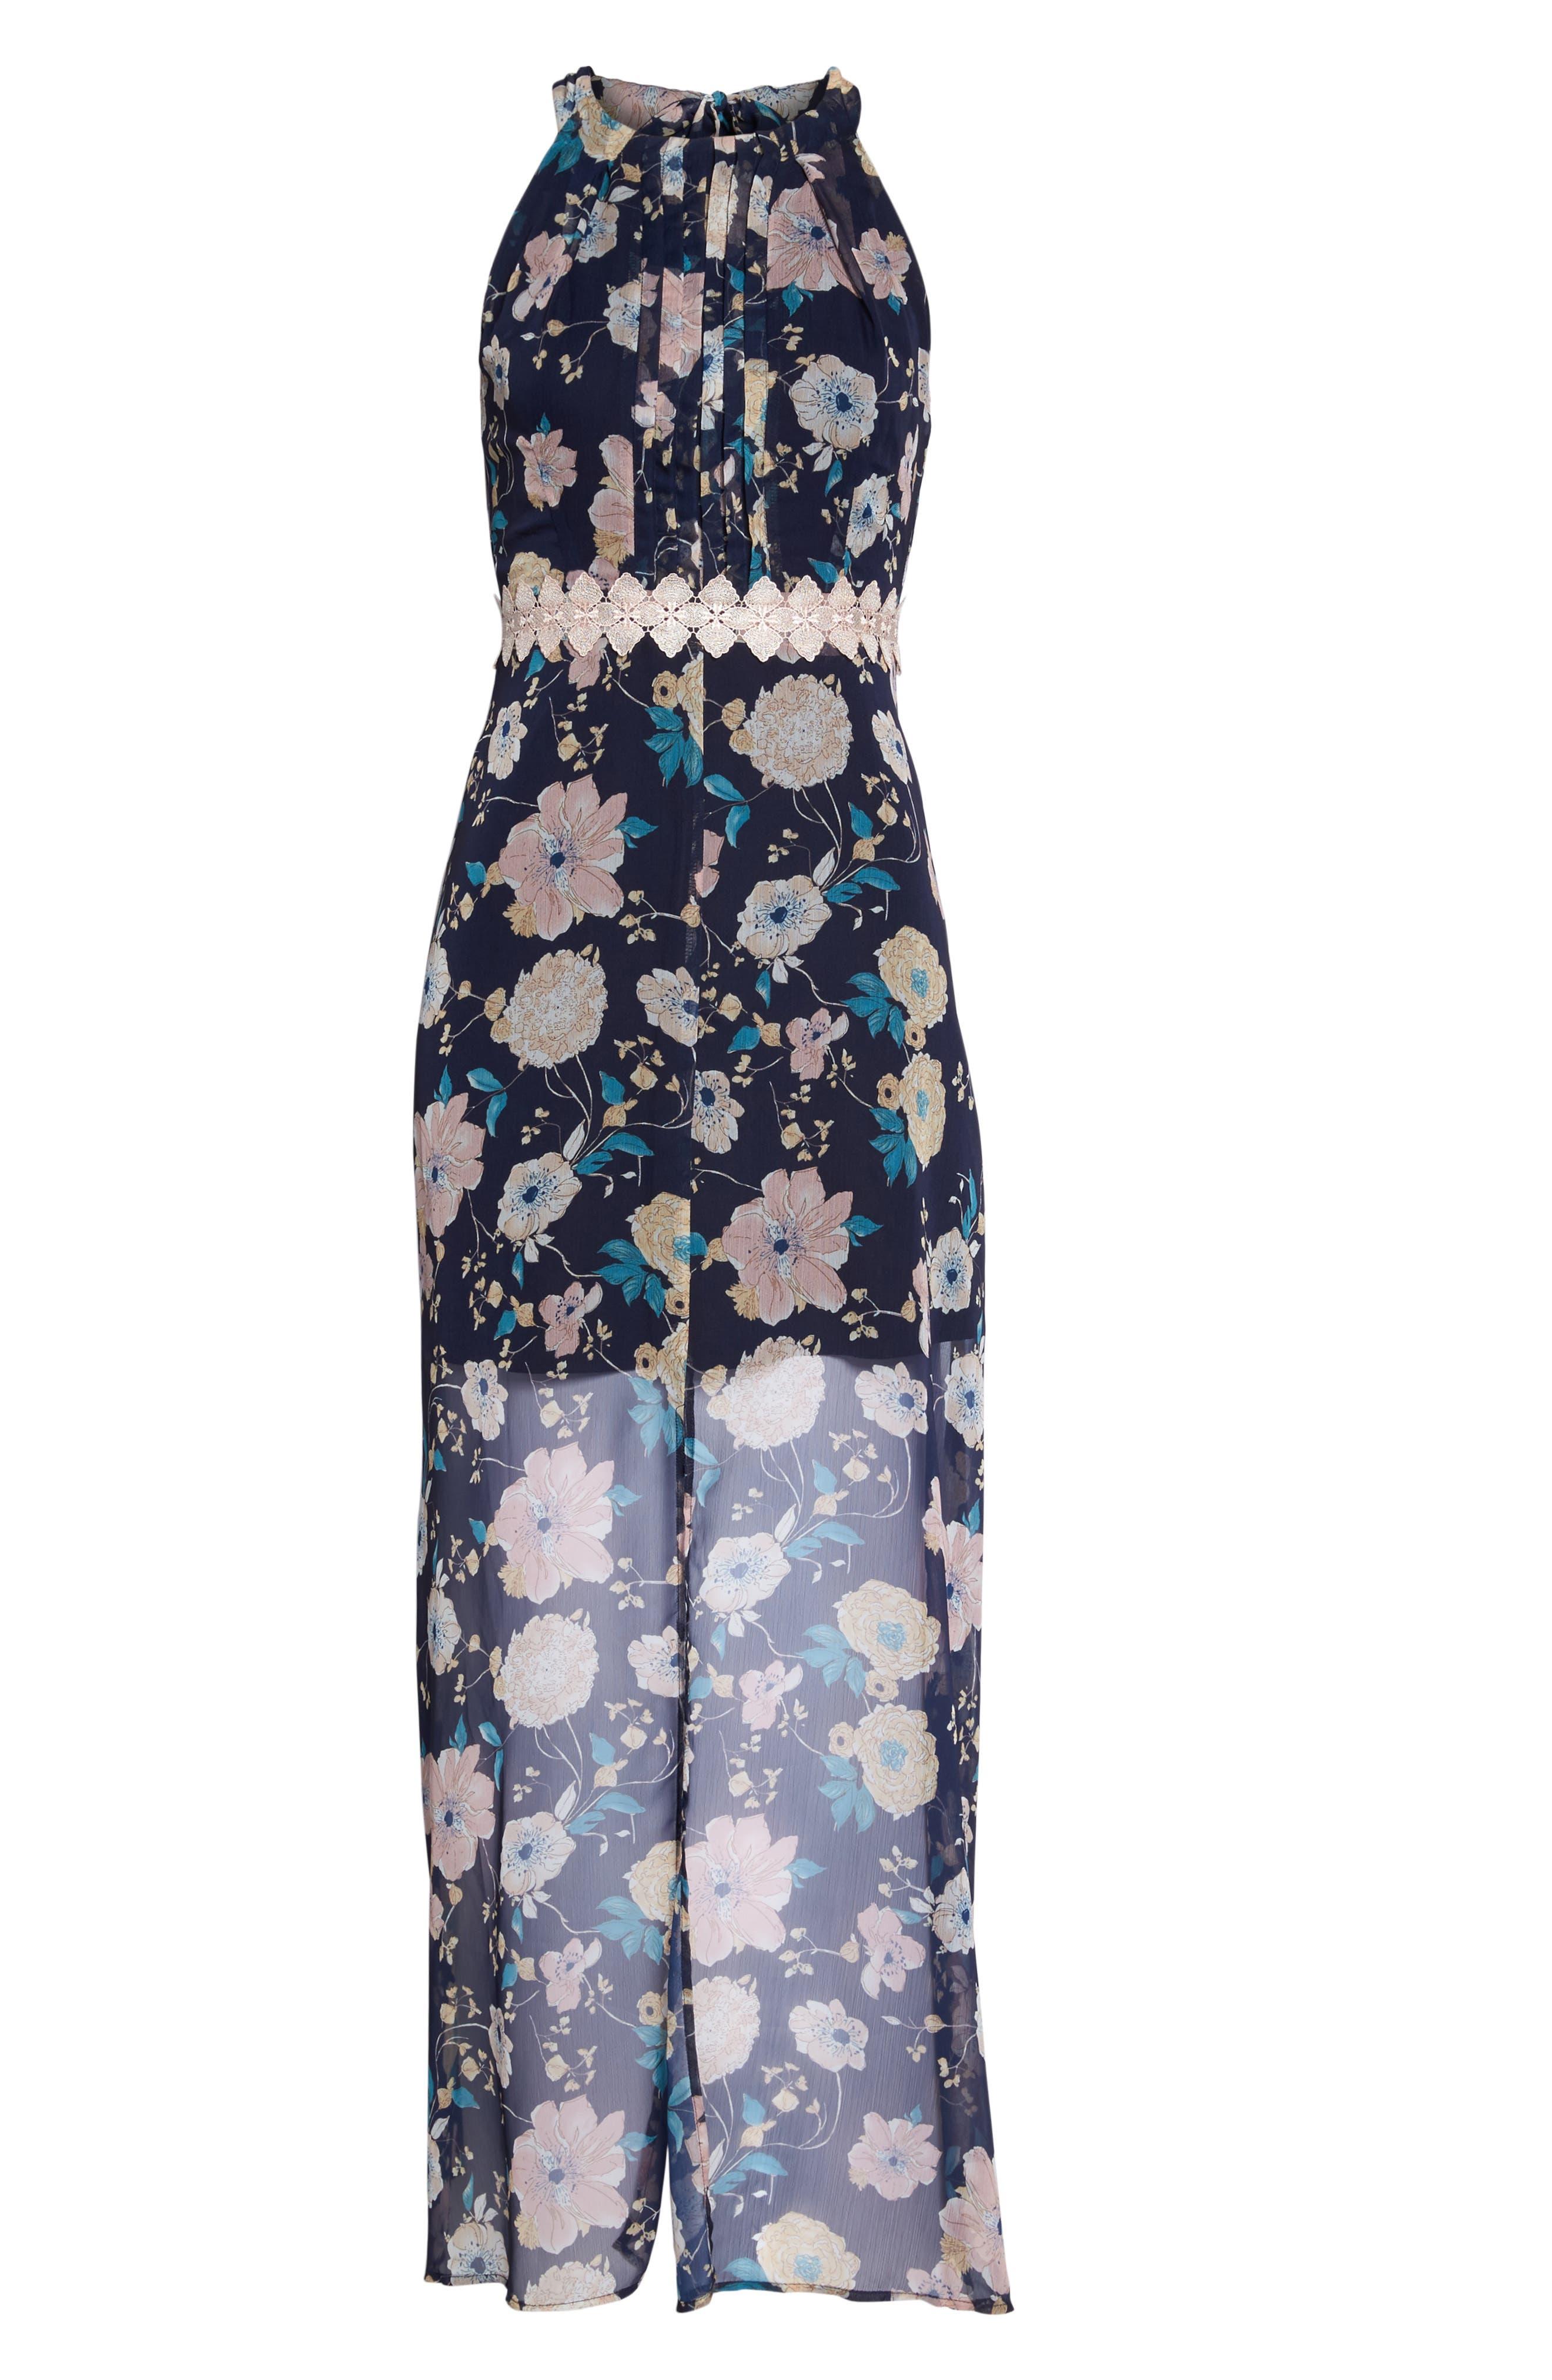 Brylee Floral Print Maxi Dress,                             Alternate thumbnail 6, color,                             400